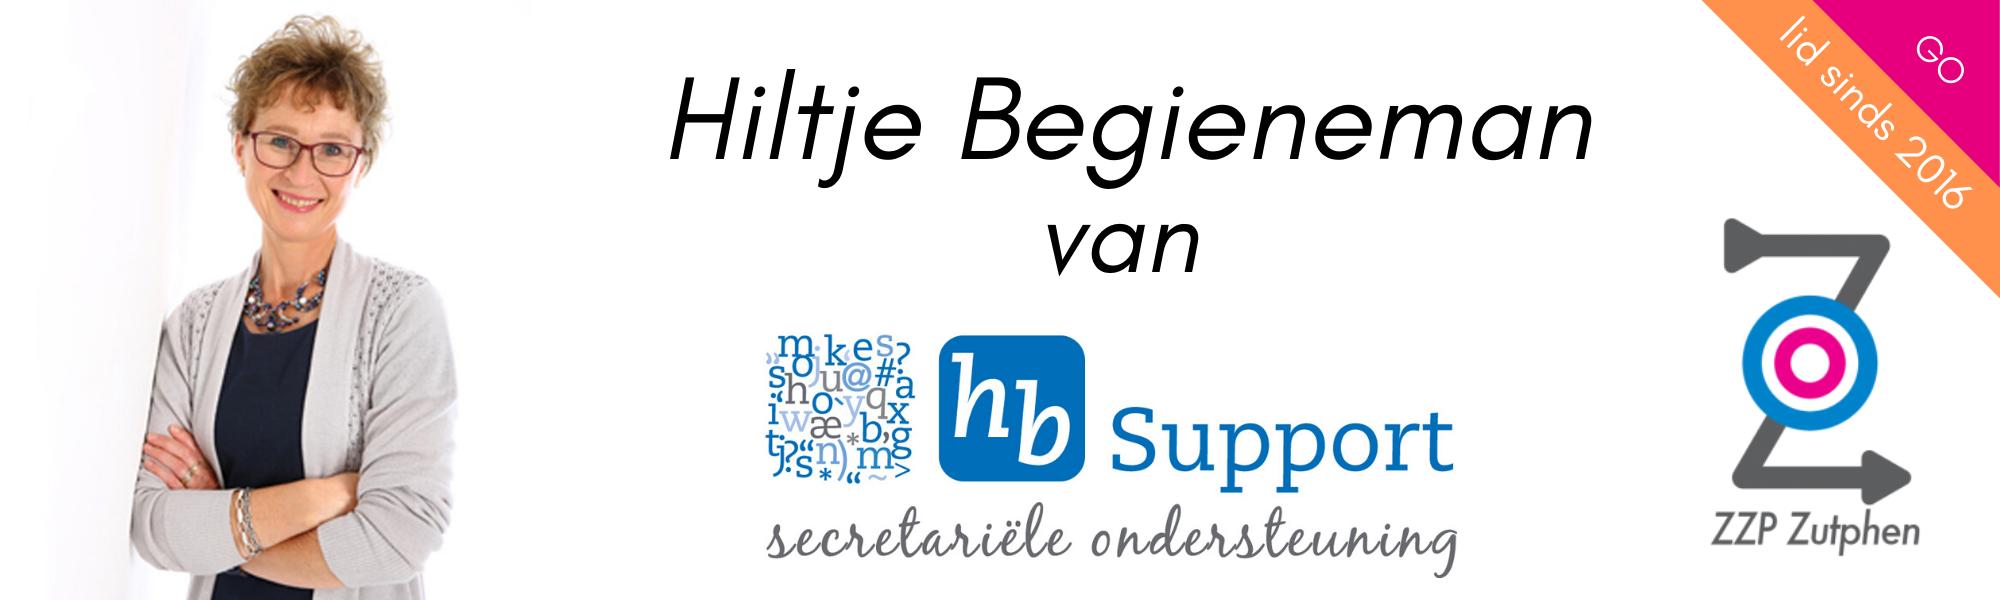 hbsupport-secretariële-ondersteuning-brummen-zzpzutphen